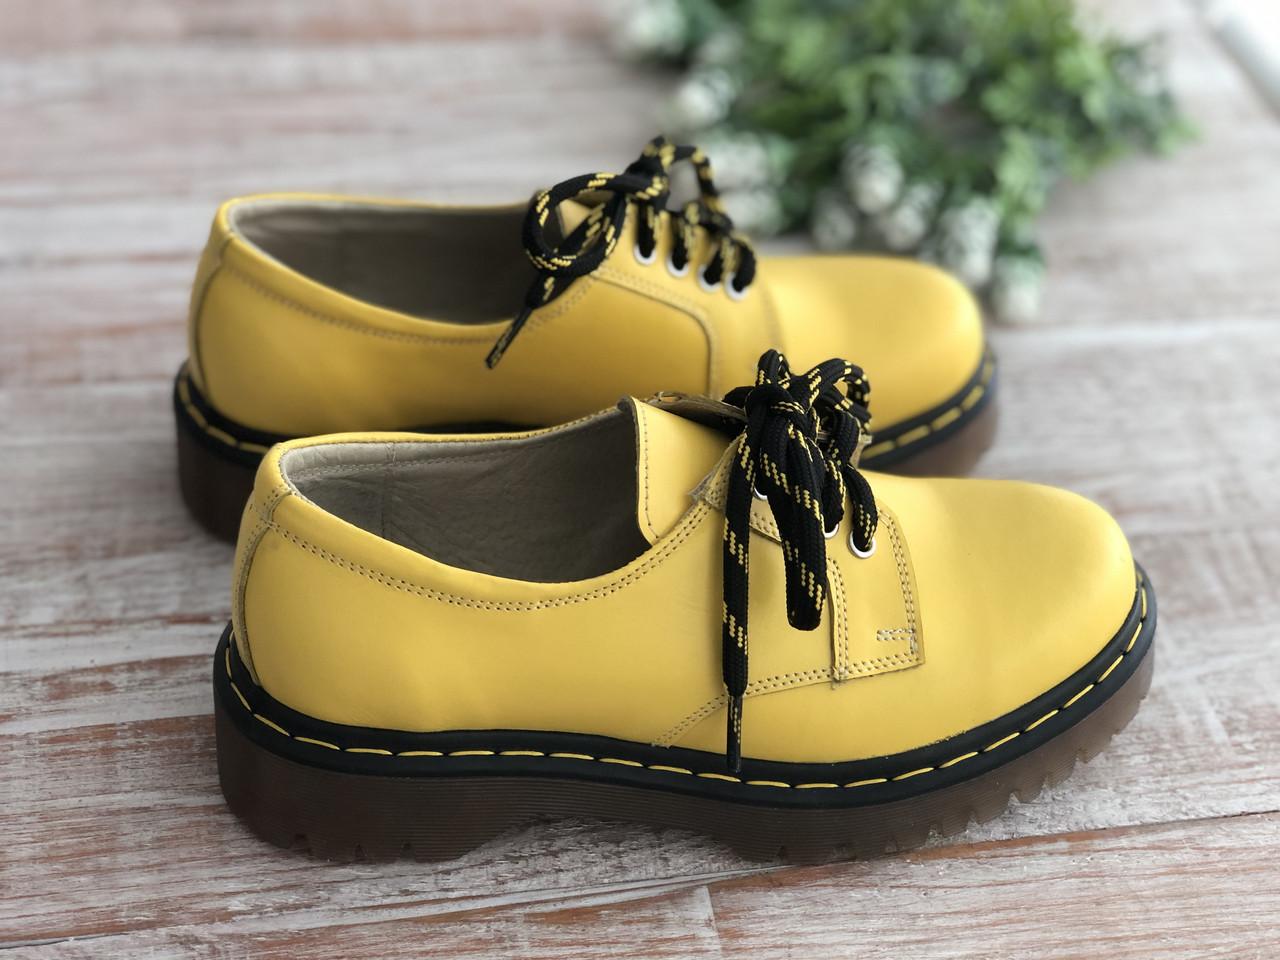 Кожаные женские ботинки 2323 жел размеры 36,37,38